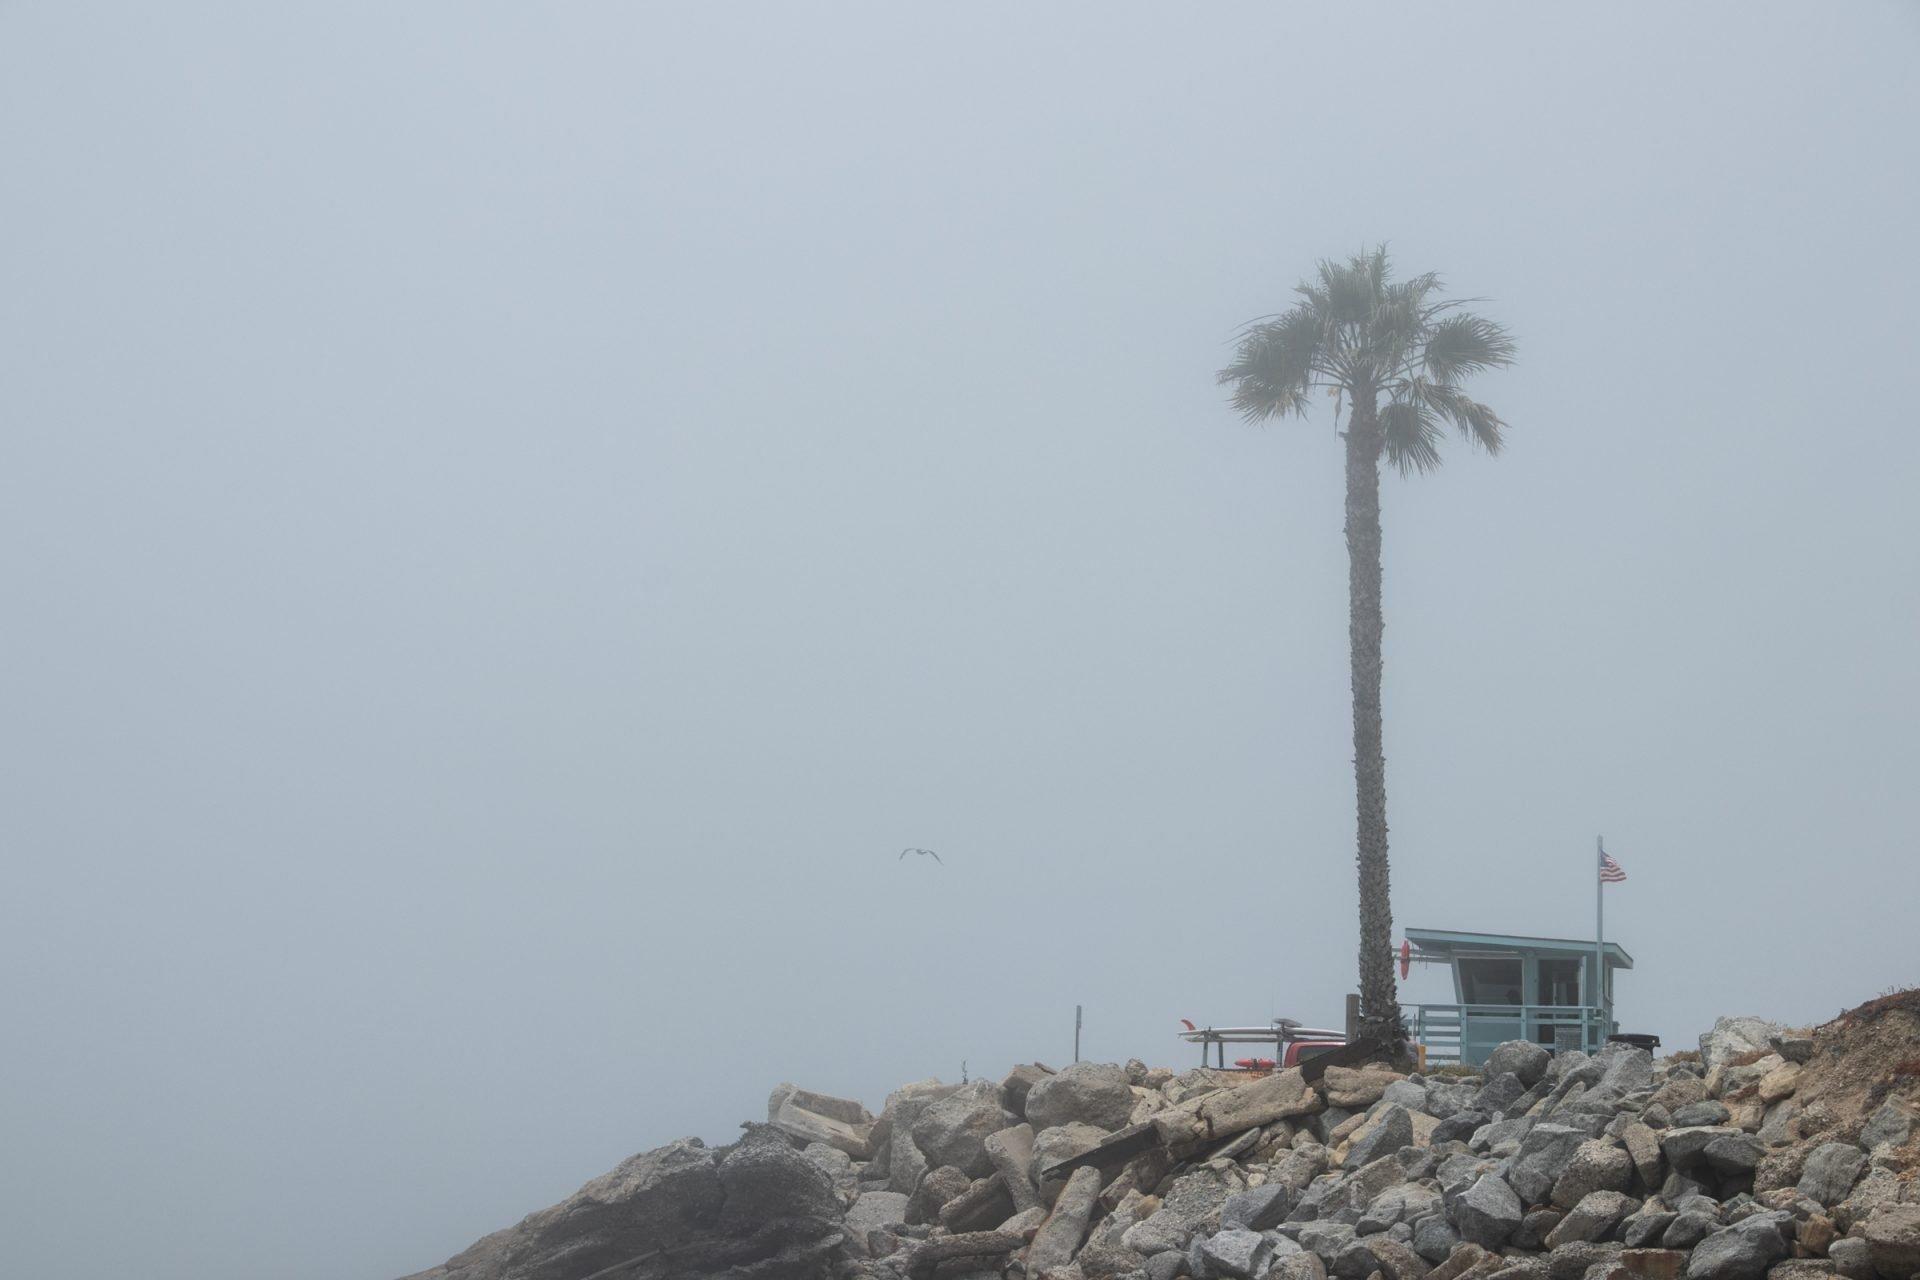 Single Palm Tree Near Rocks